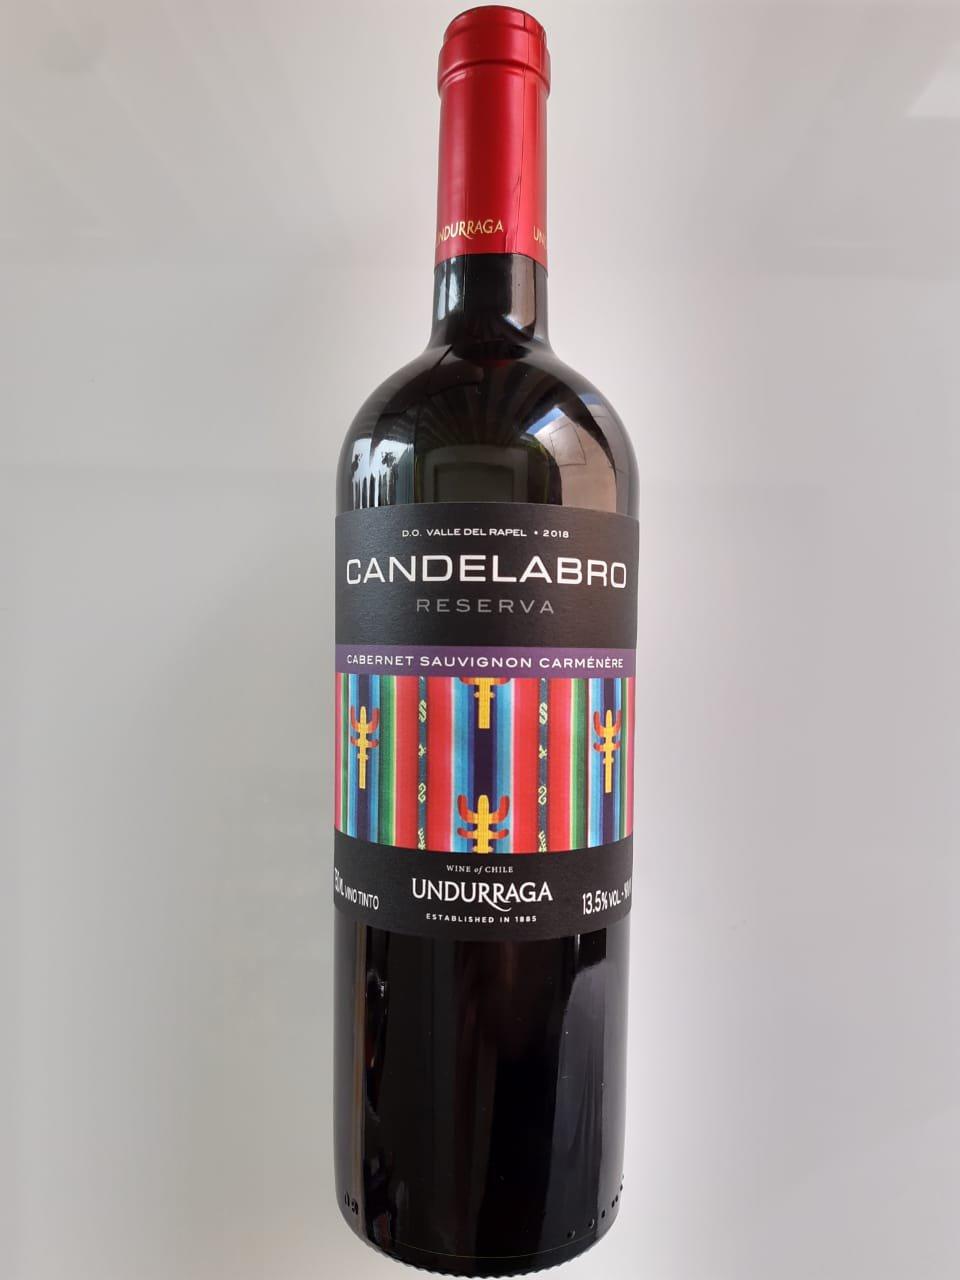 Vinho Candelabro Reserva Cabernet Sauvignon/Carménère 750ml